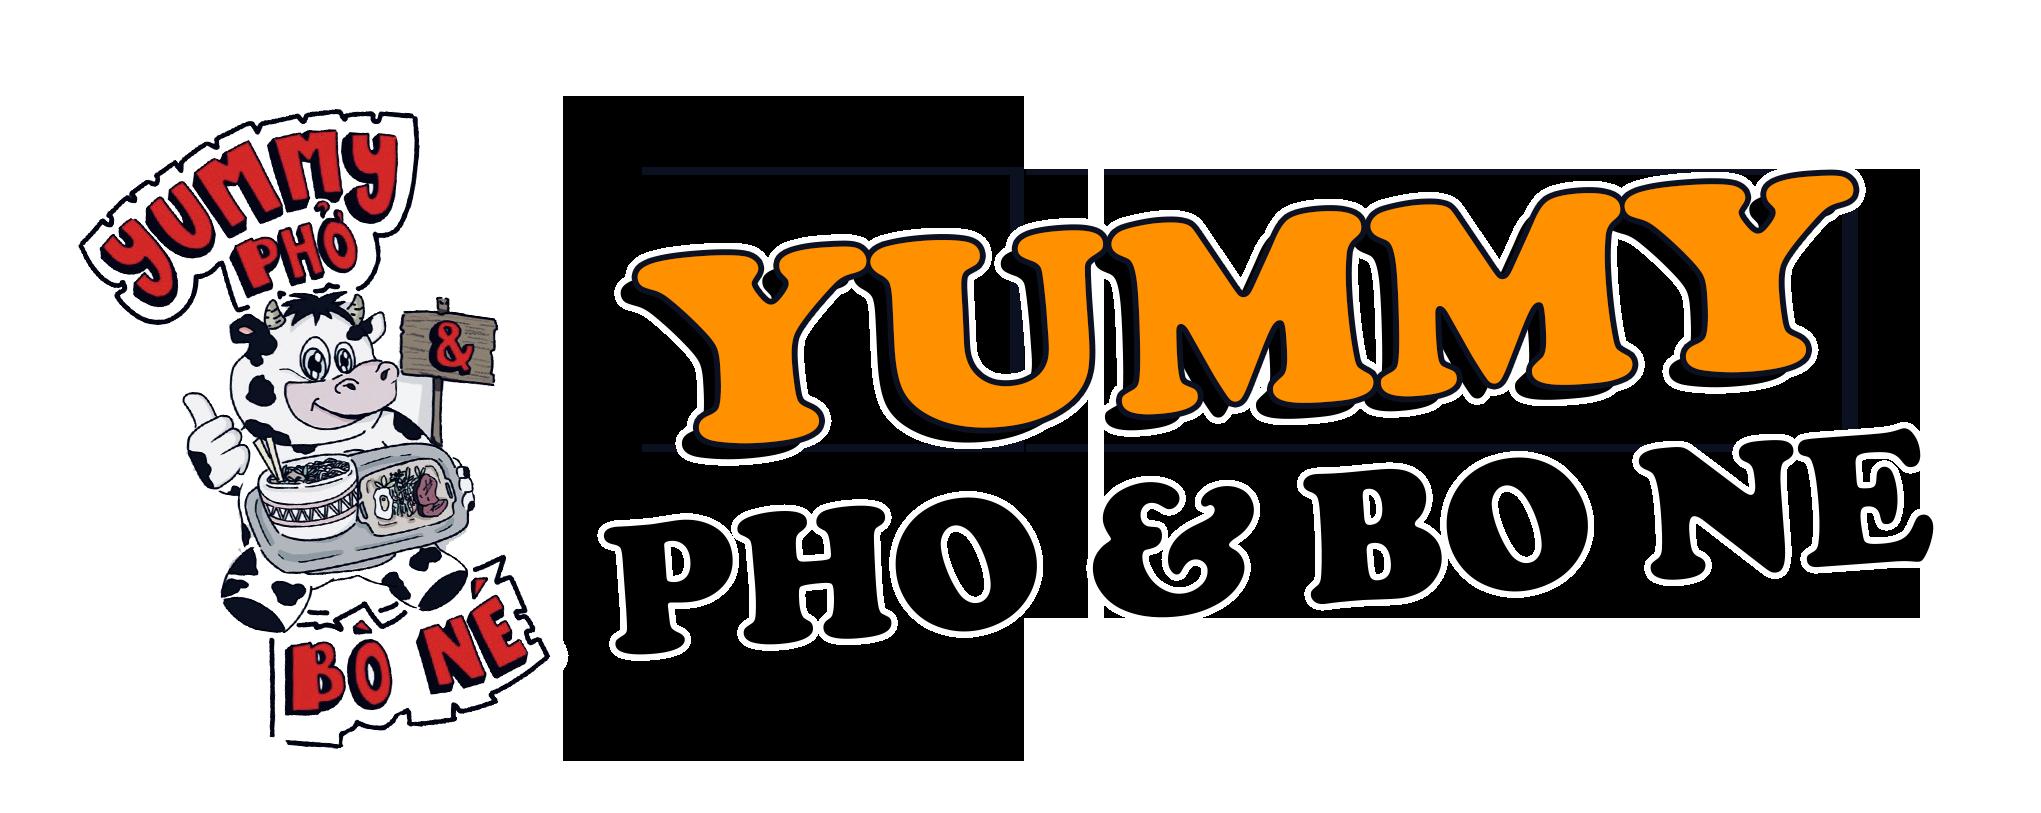 Yummy & Bo Ne Pearland